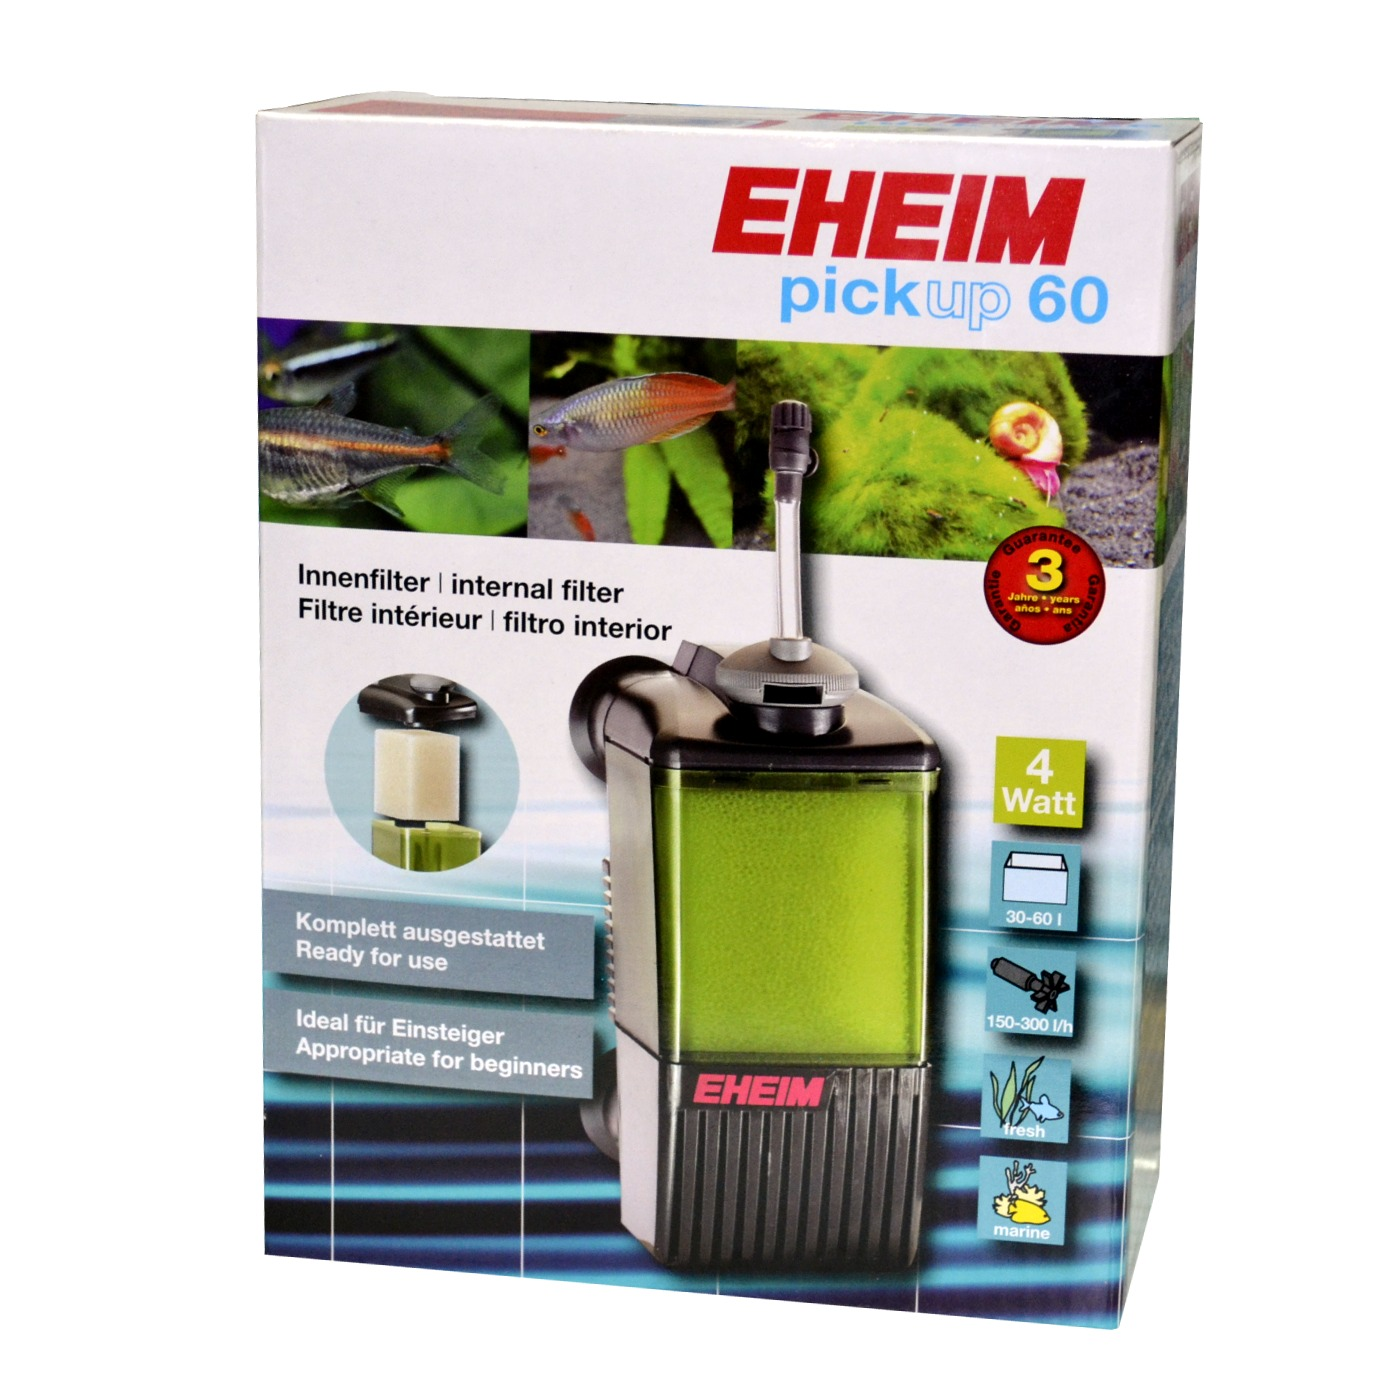 Eheim pickup 60 filtre interne pour aquarium de 30 60 l for Filtre petit aquarium